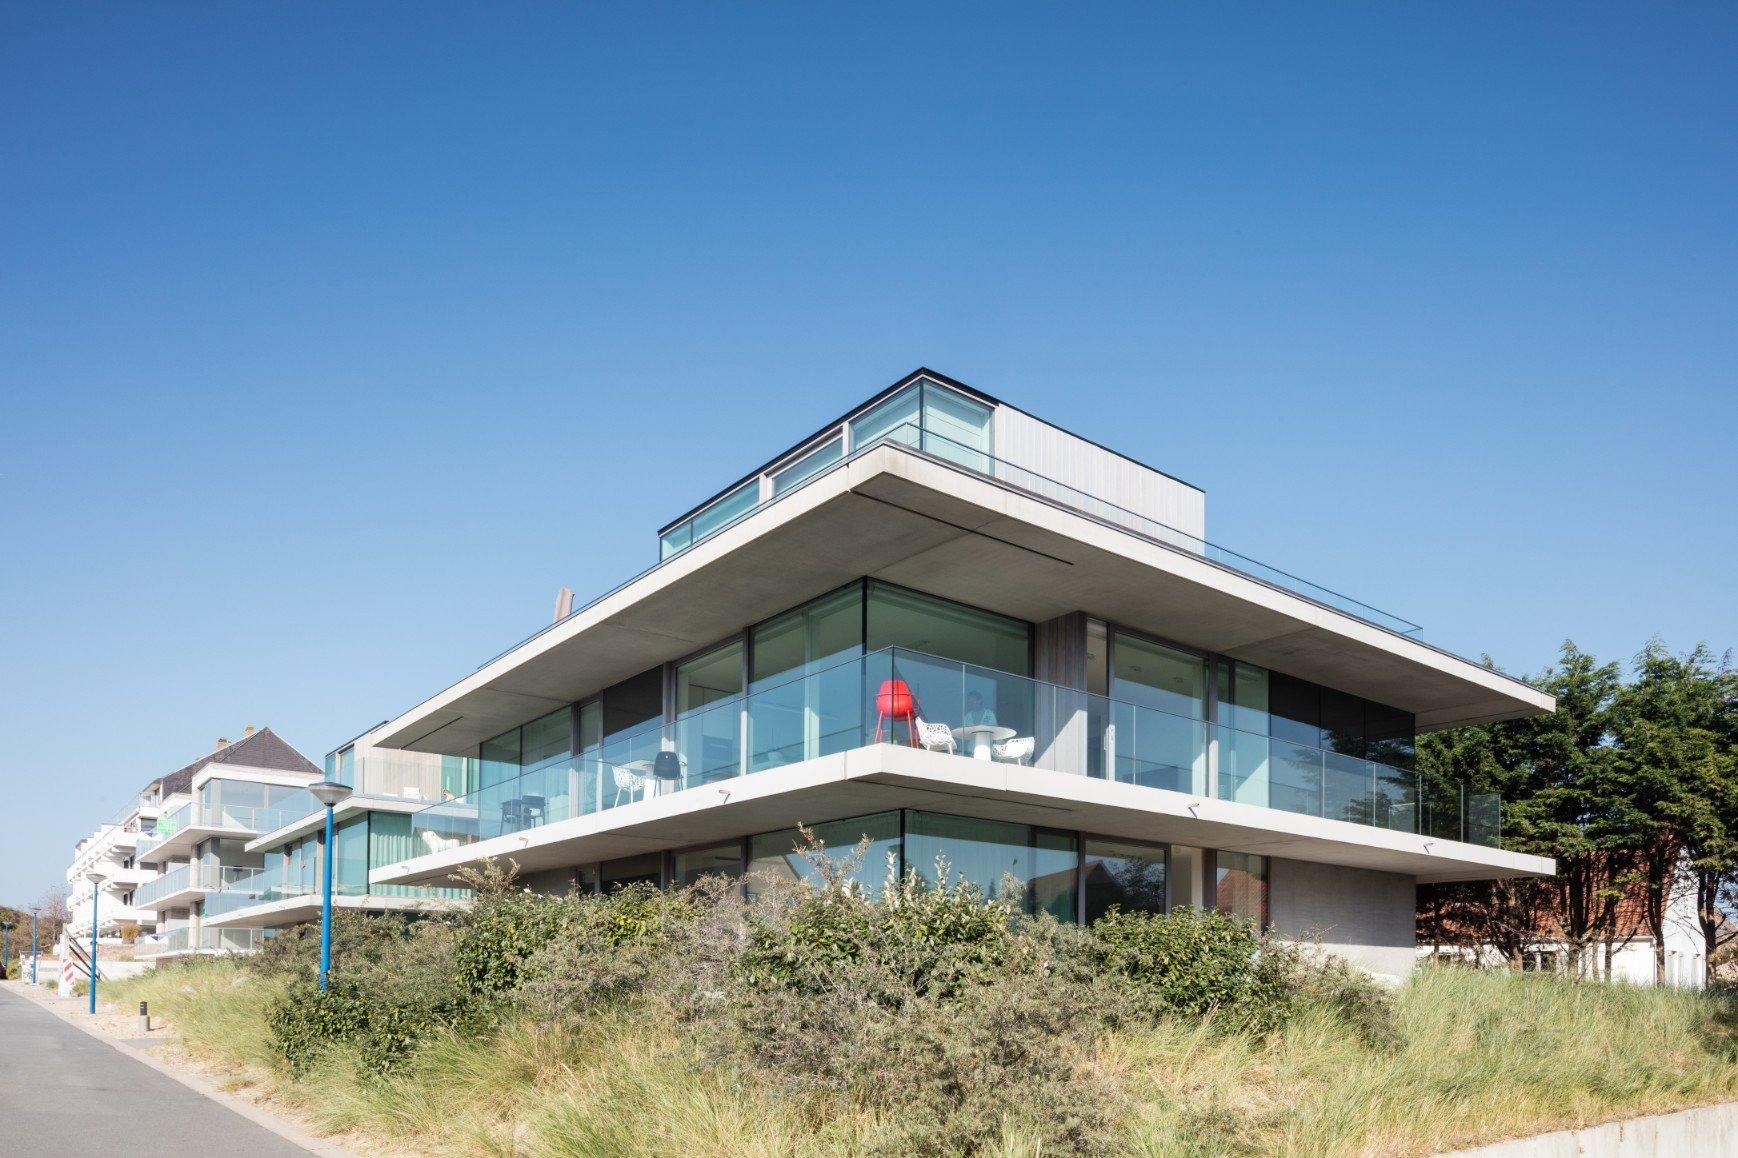 Rietveldprojects.be-Twins-Gropius-Breuer-appartement-design-architectuur-kust7.jpg